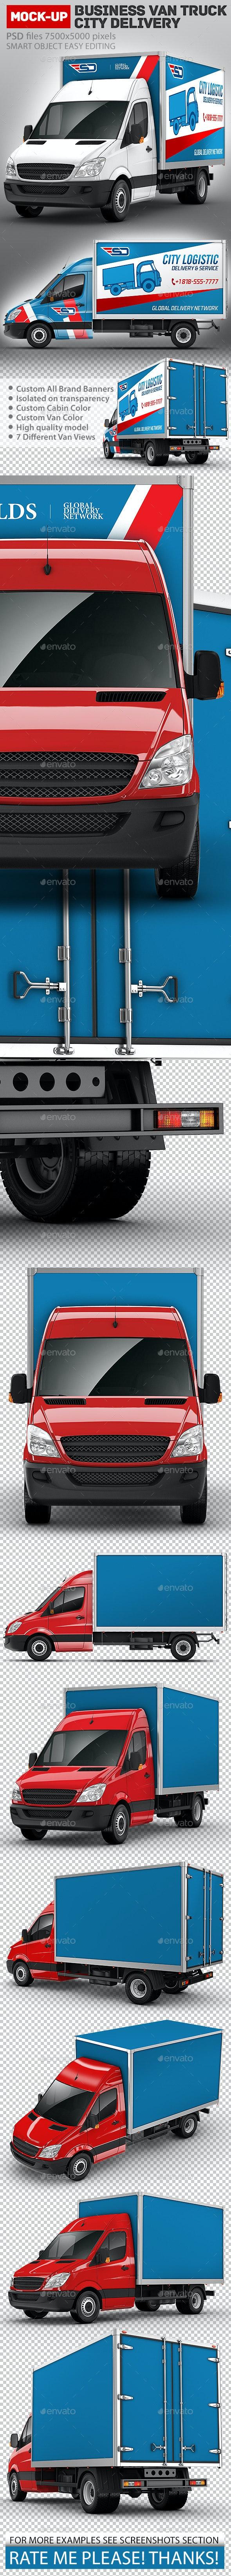 Business Van Truck city delivery Mock-Up - Vehicle Wraps Print